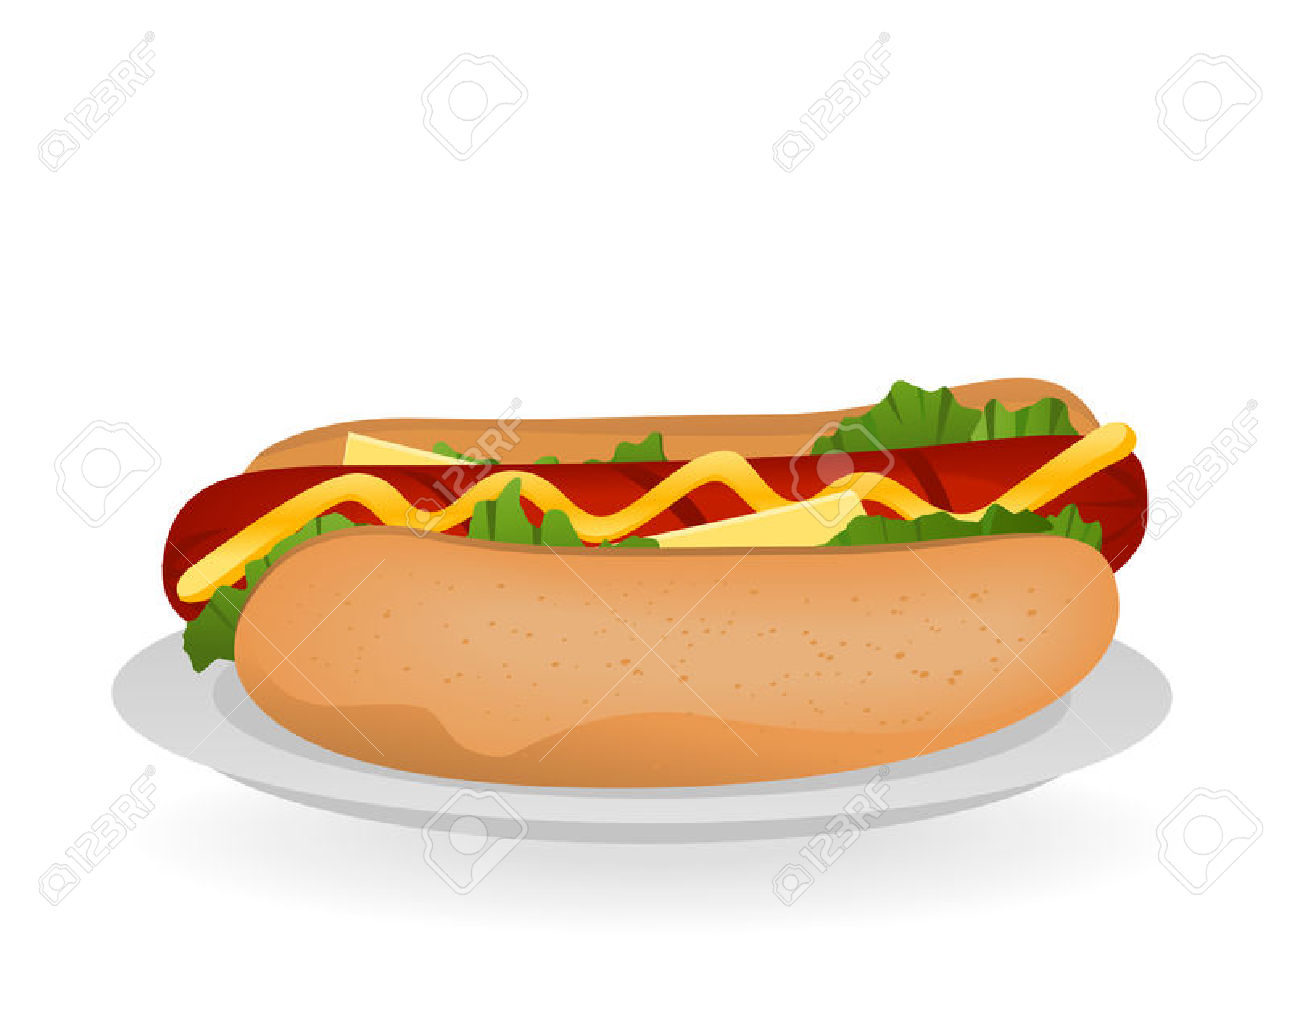 Sandwich clipart plate food Clip Clipart Print ClipartMe 4013